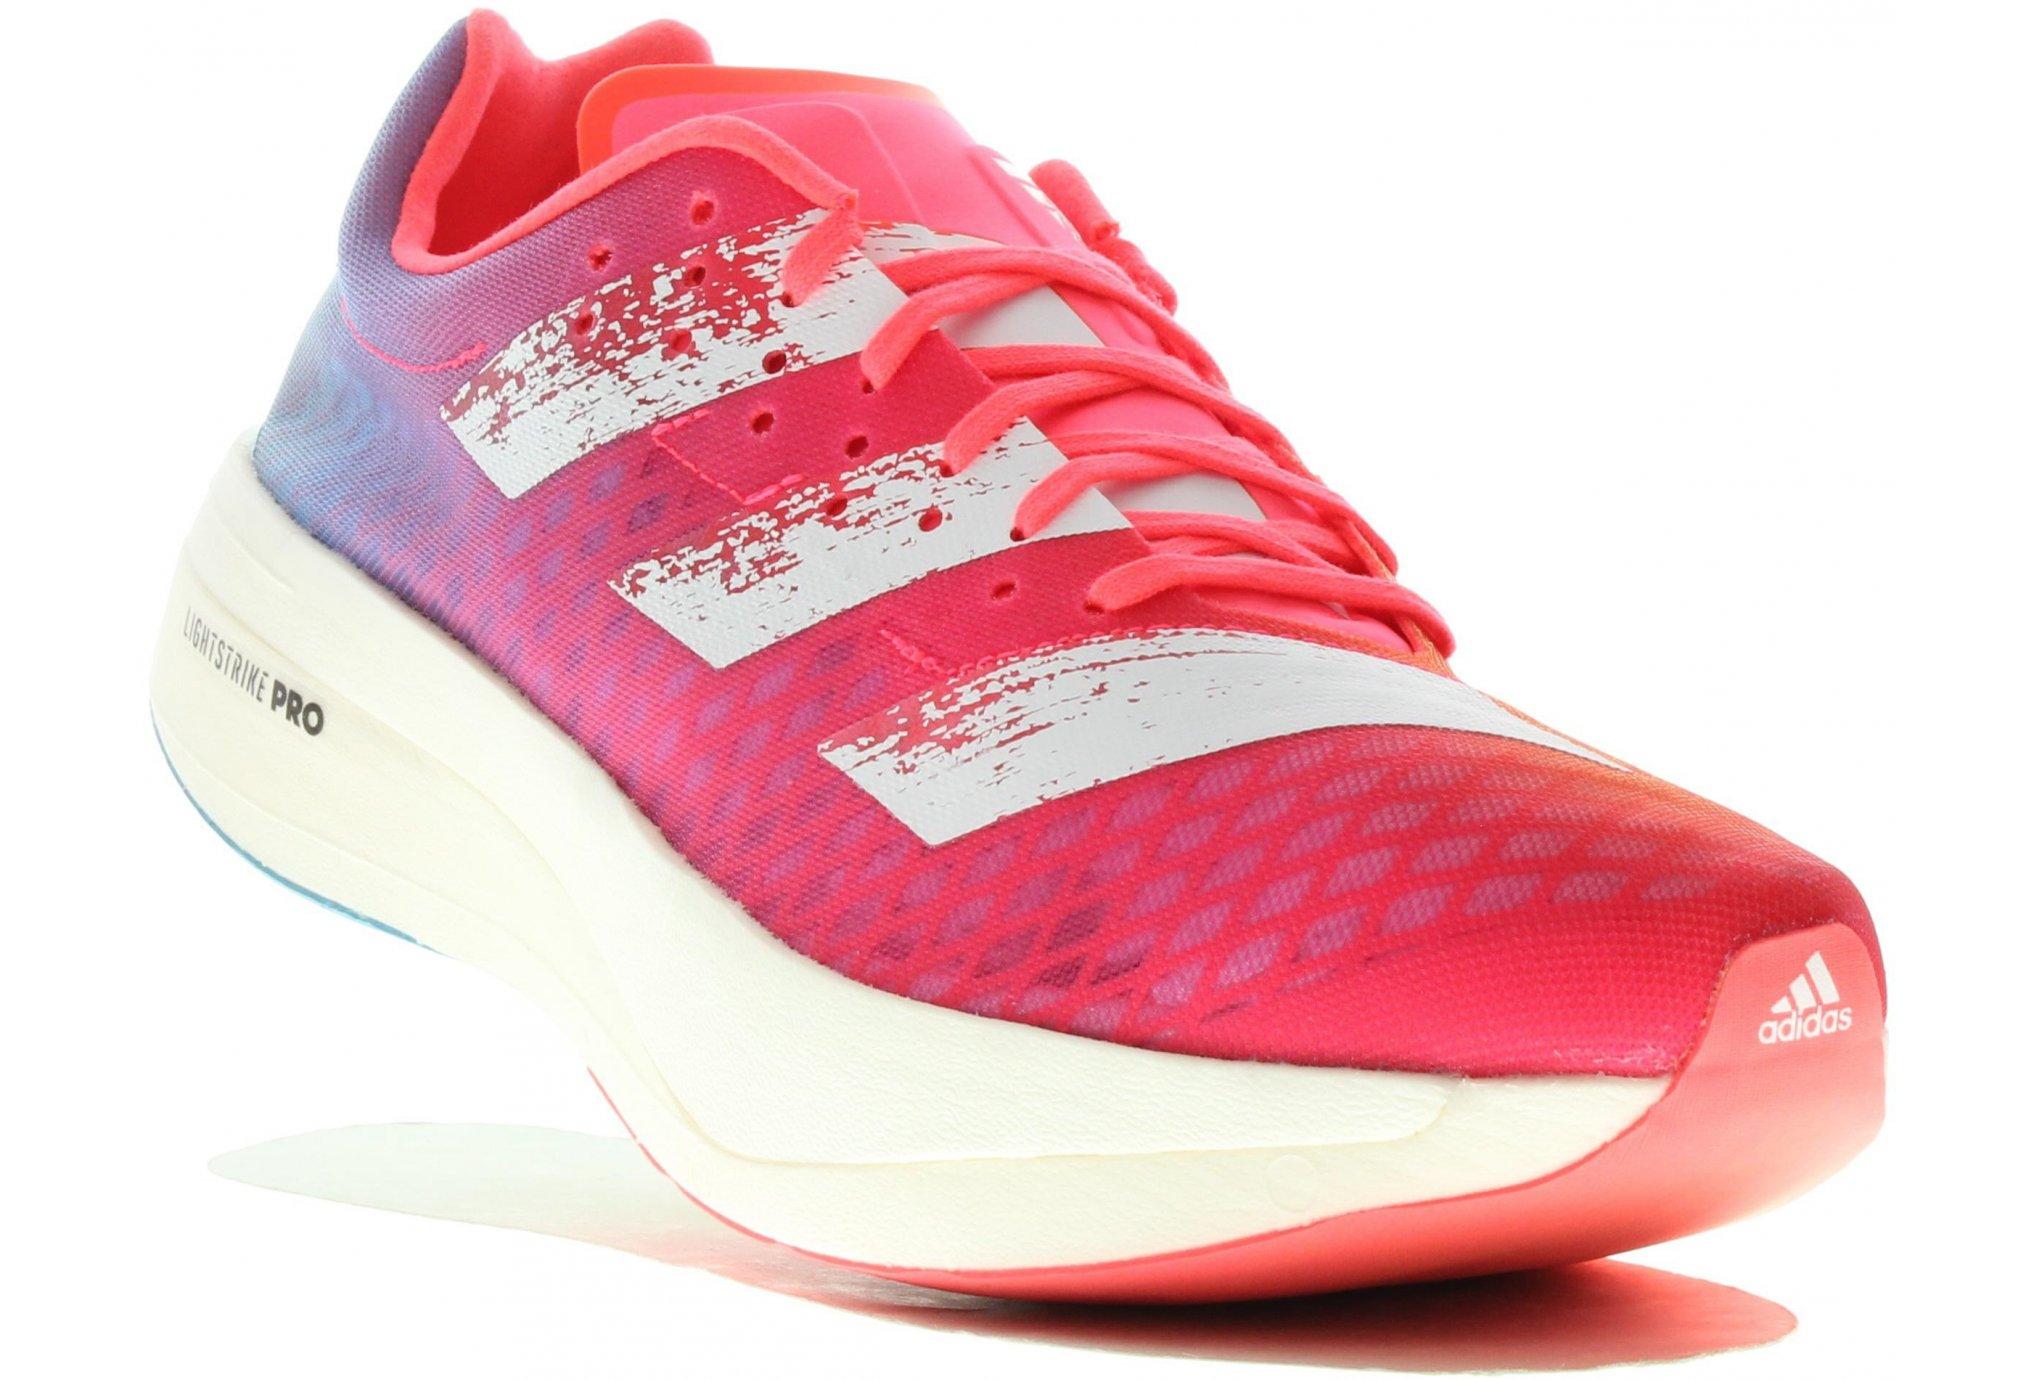 adidas adizero adios Pro Chaussures homme